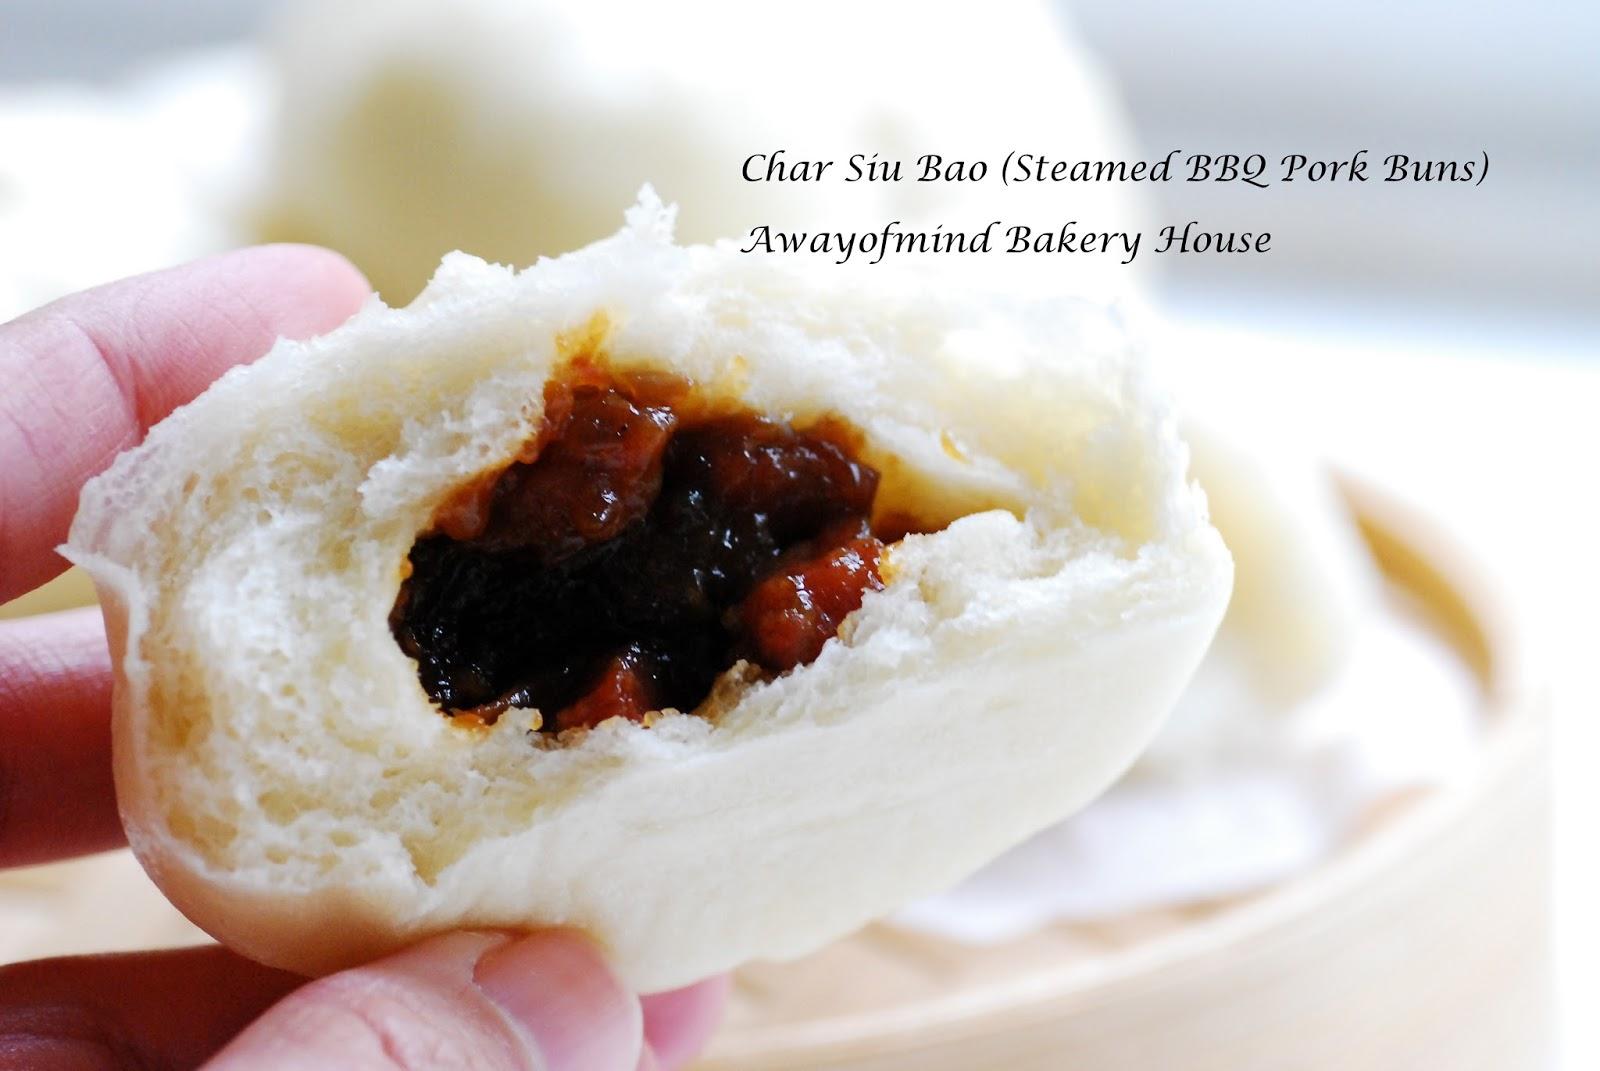 Awayofmind Bakery House: Char Siu Bao (Steamed BBQ Pork Buns) 叉烧包